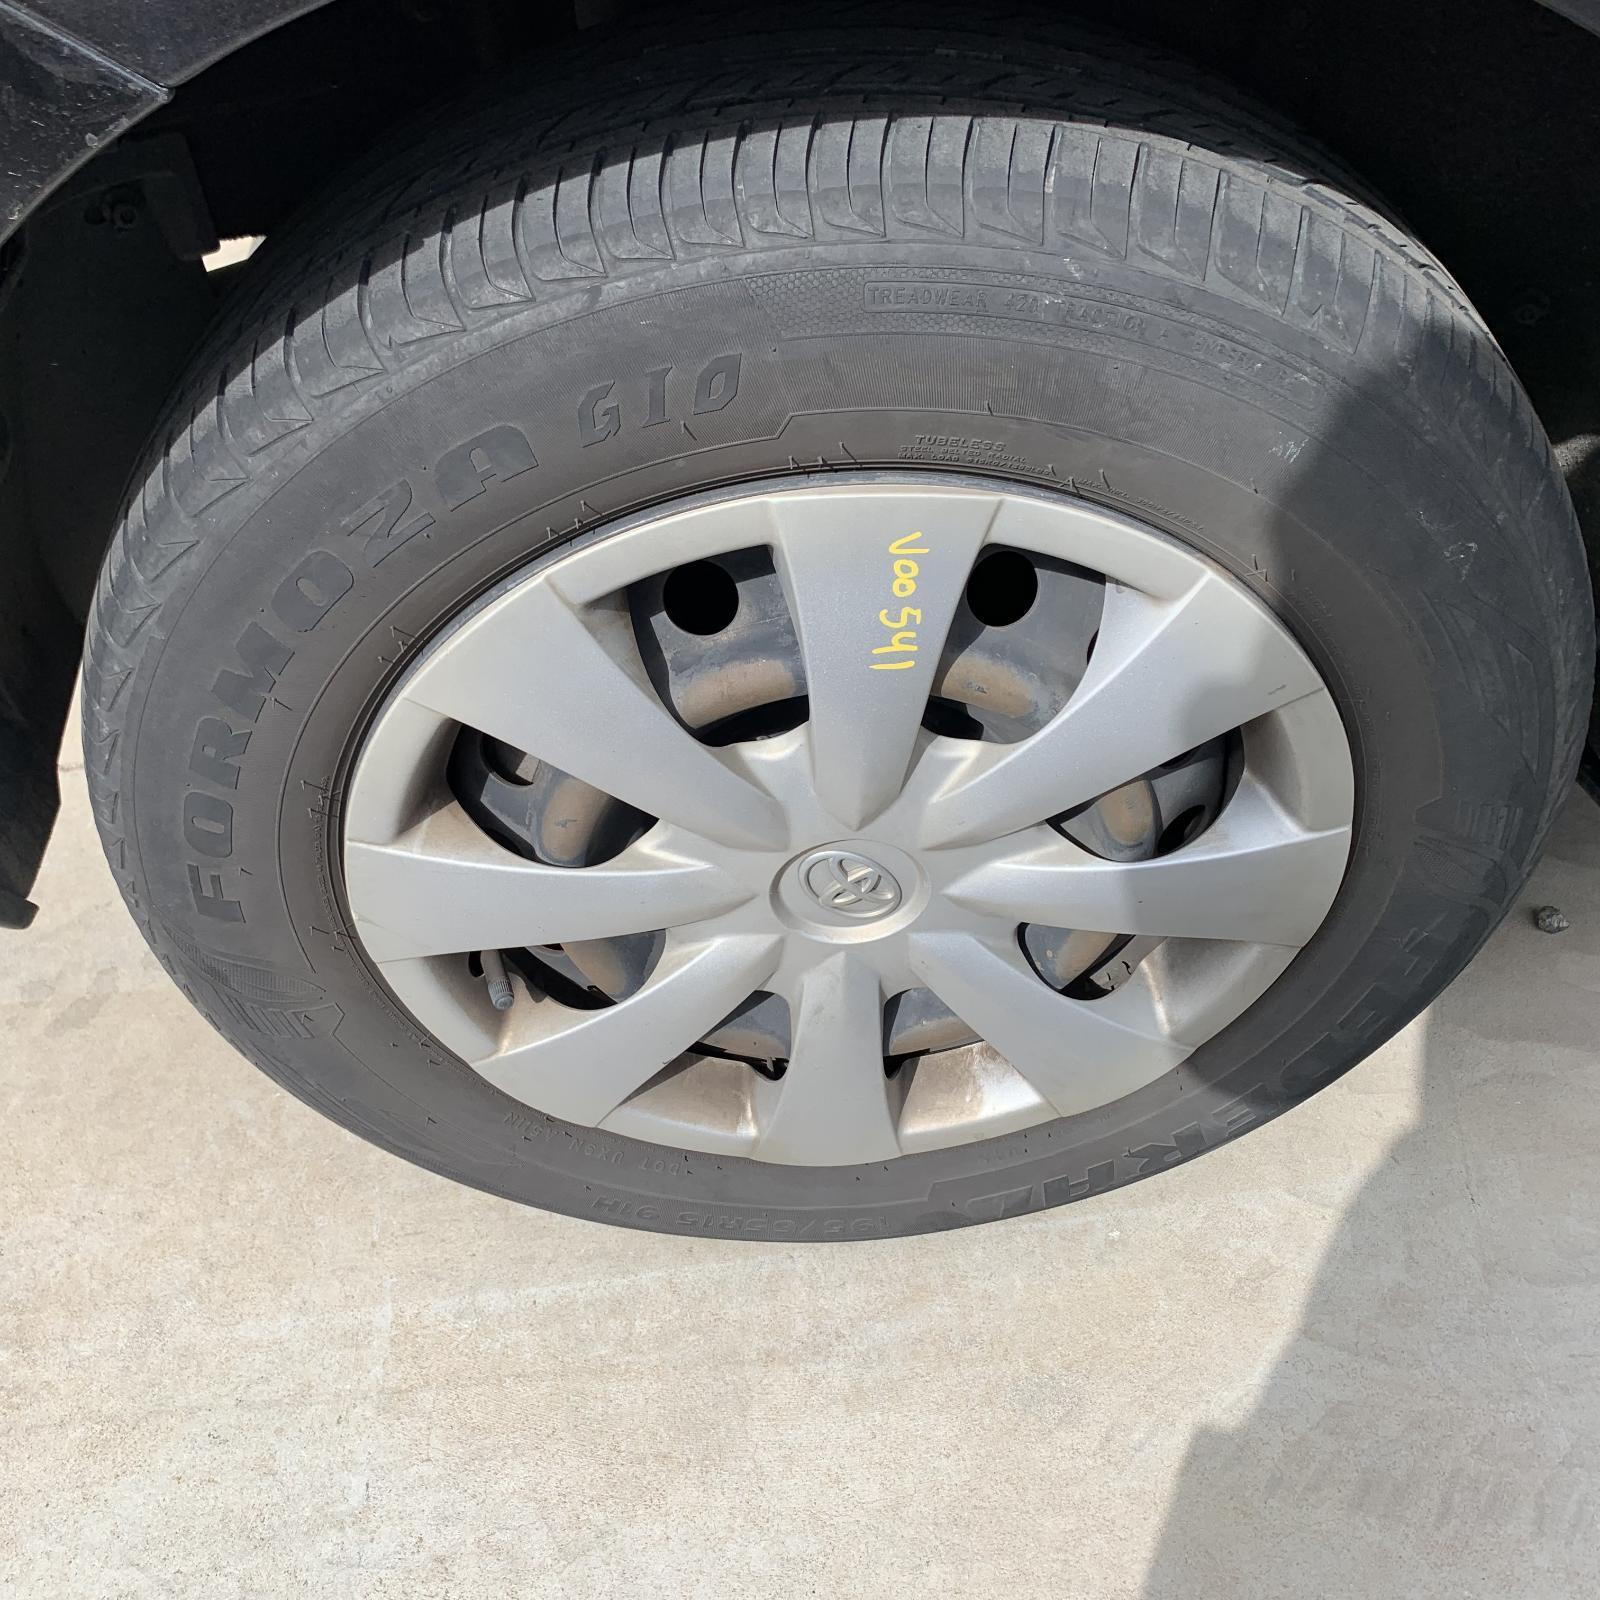 TOYOTA COROLLA, Wheel Cover/Hub Cap, 150 SERIES, 03/07-12/13